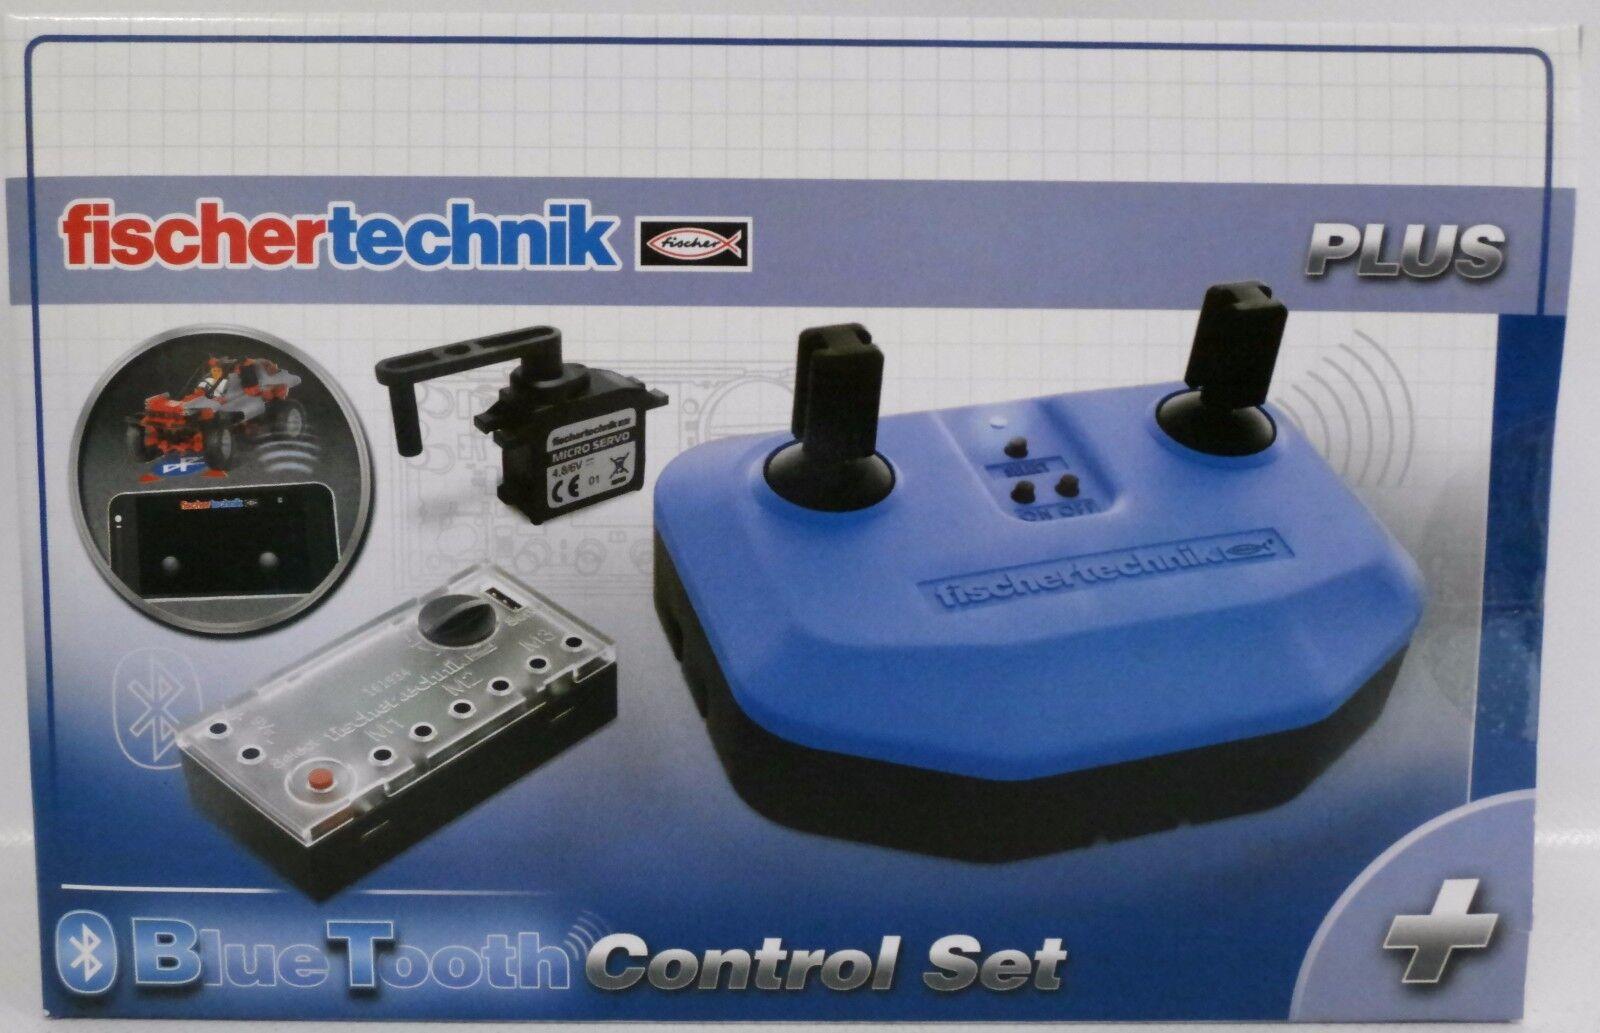 NEU fischertechnik 540585 PLUS BlauTooth Control Set OVP